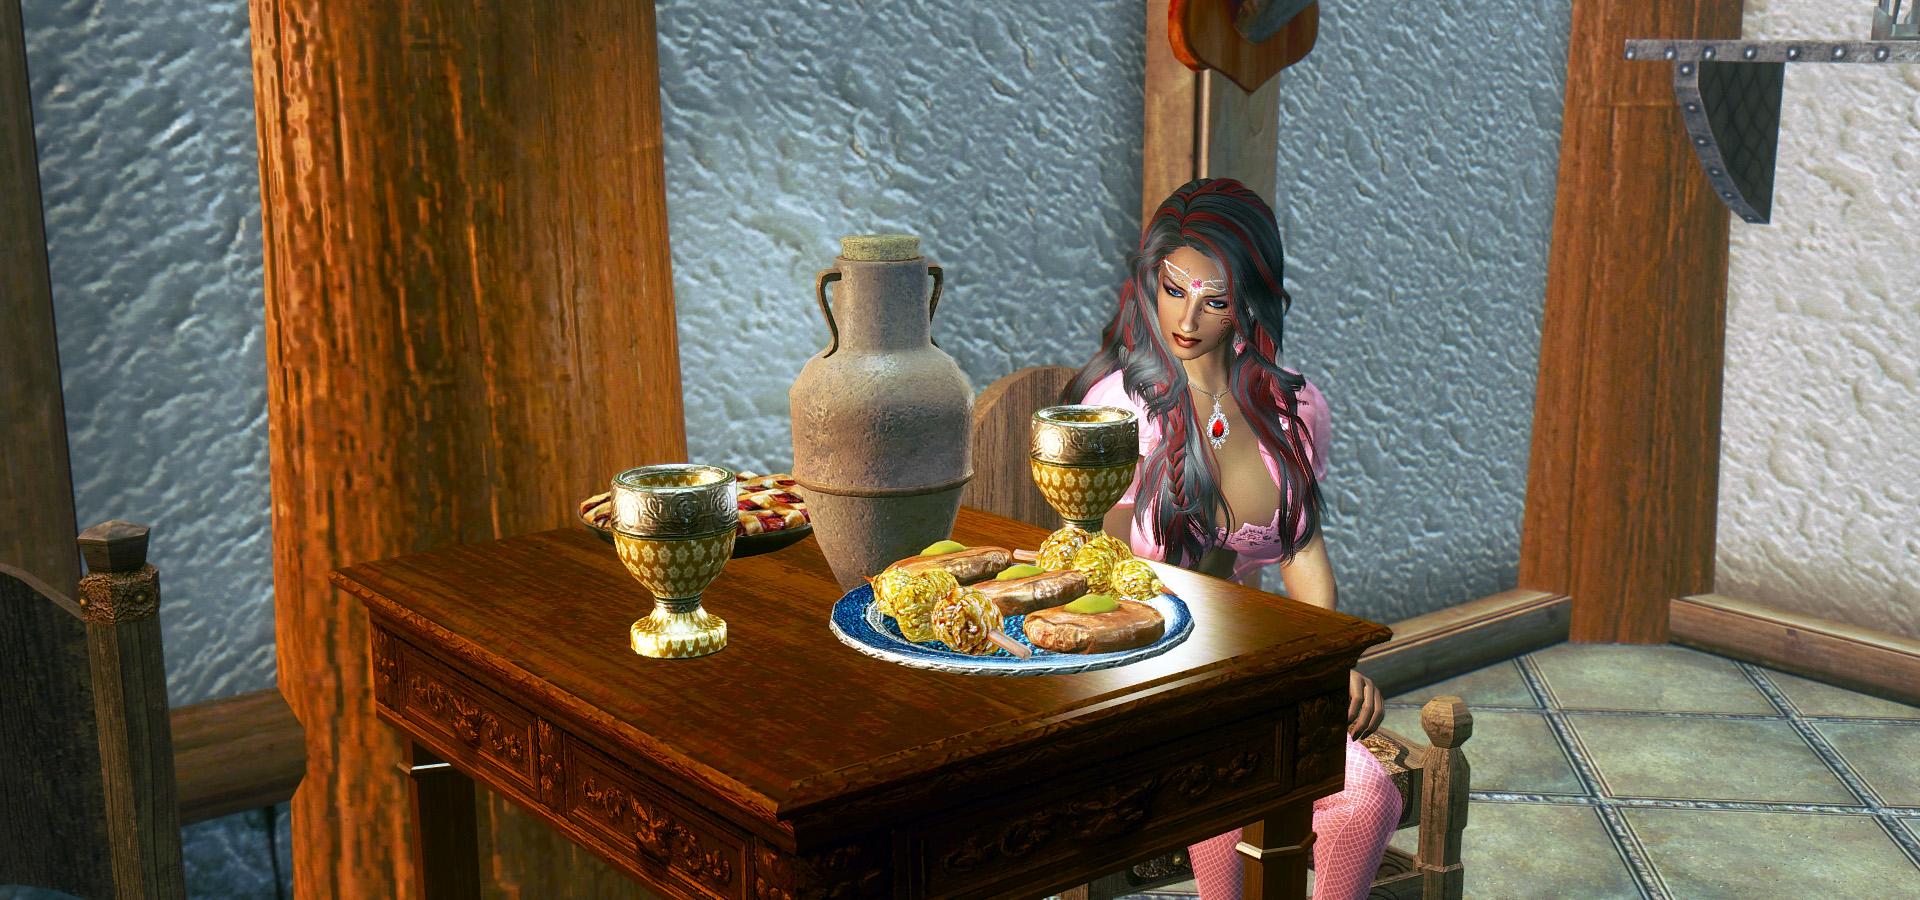 634. Столик для чаепития.jpg - Elder Scrolls 5: Skyrim, the CBBE, Сборка-21